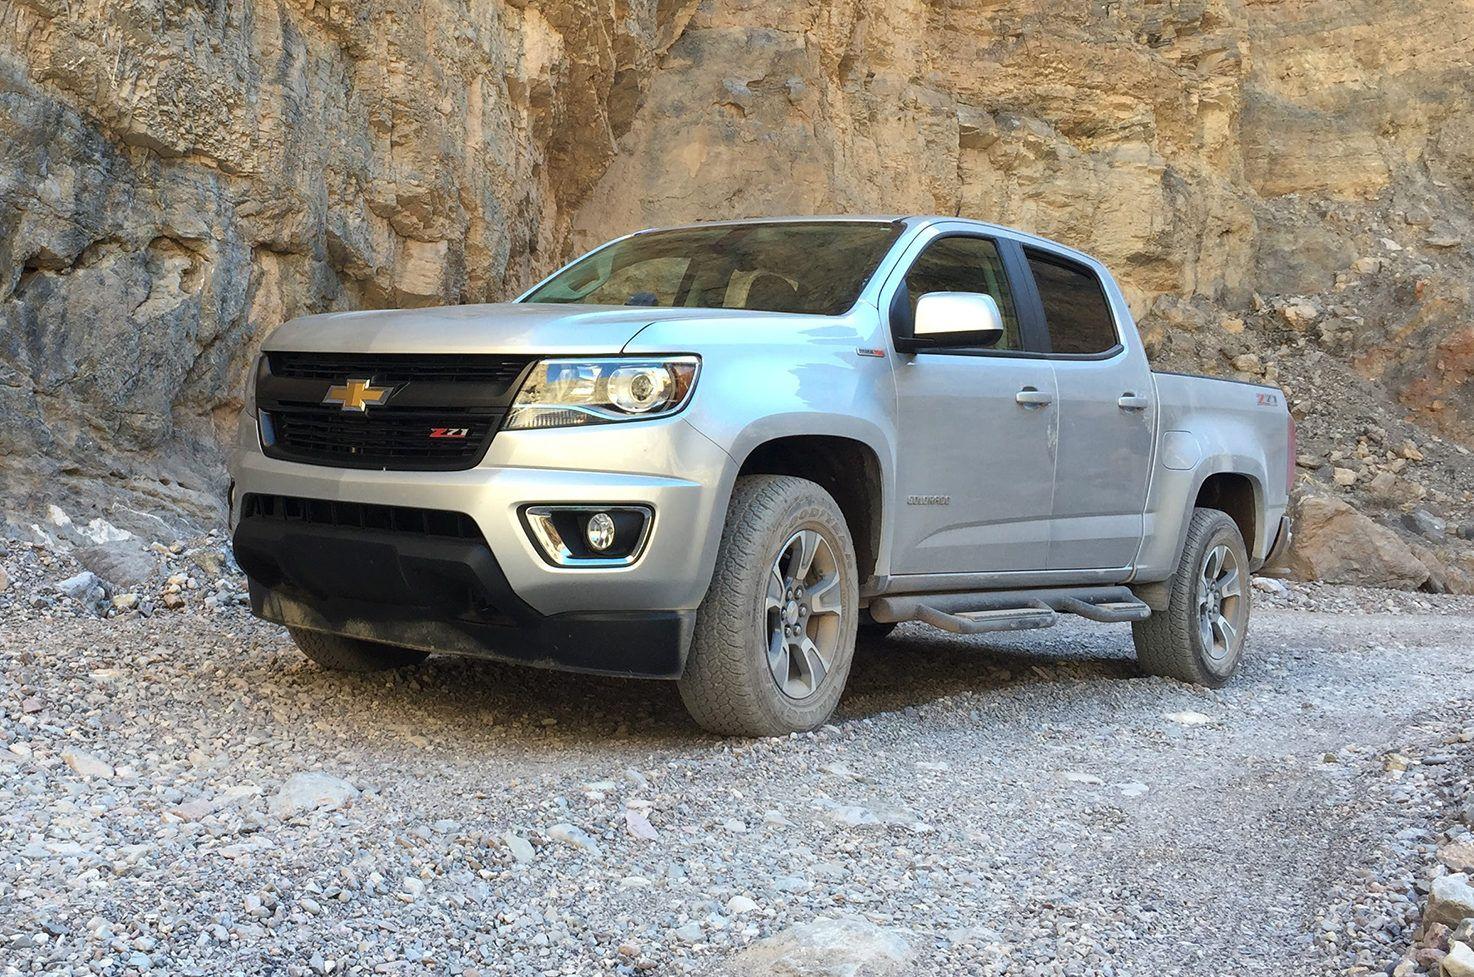 2016 Chevrolet Colorado Z71 Diesel Review Long Term Update 6 Chevrolet Colorado Z71 Chevrolet Colorado Chevrolet